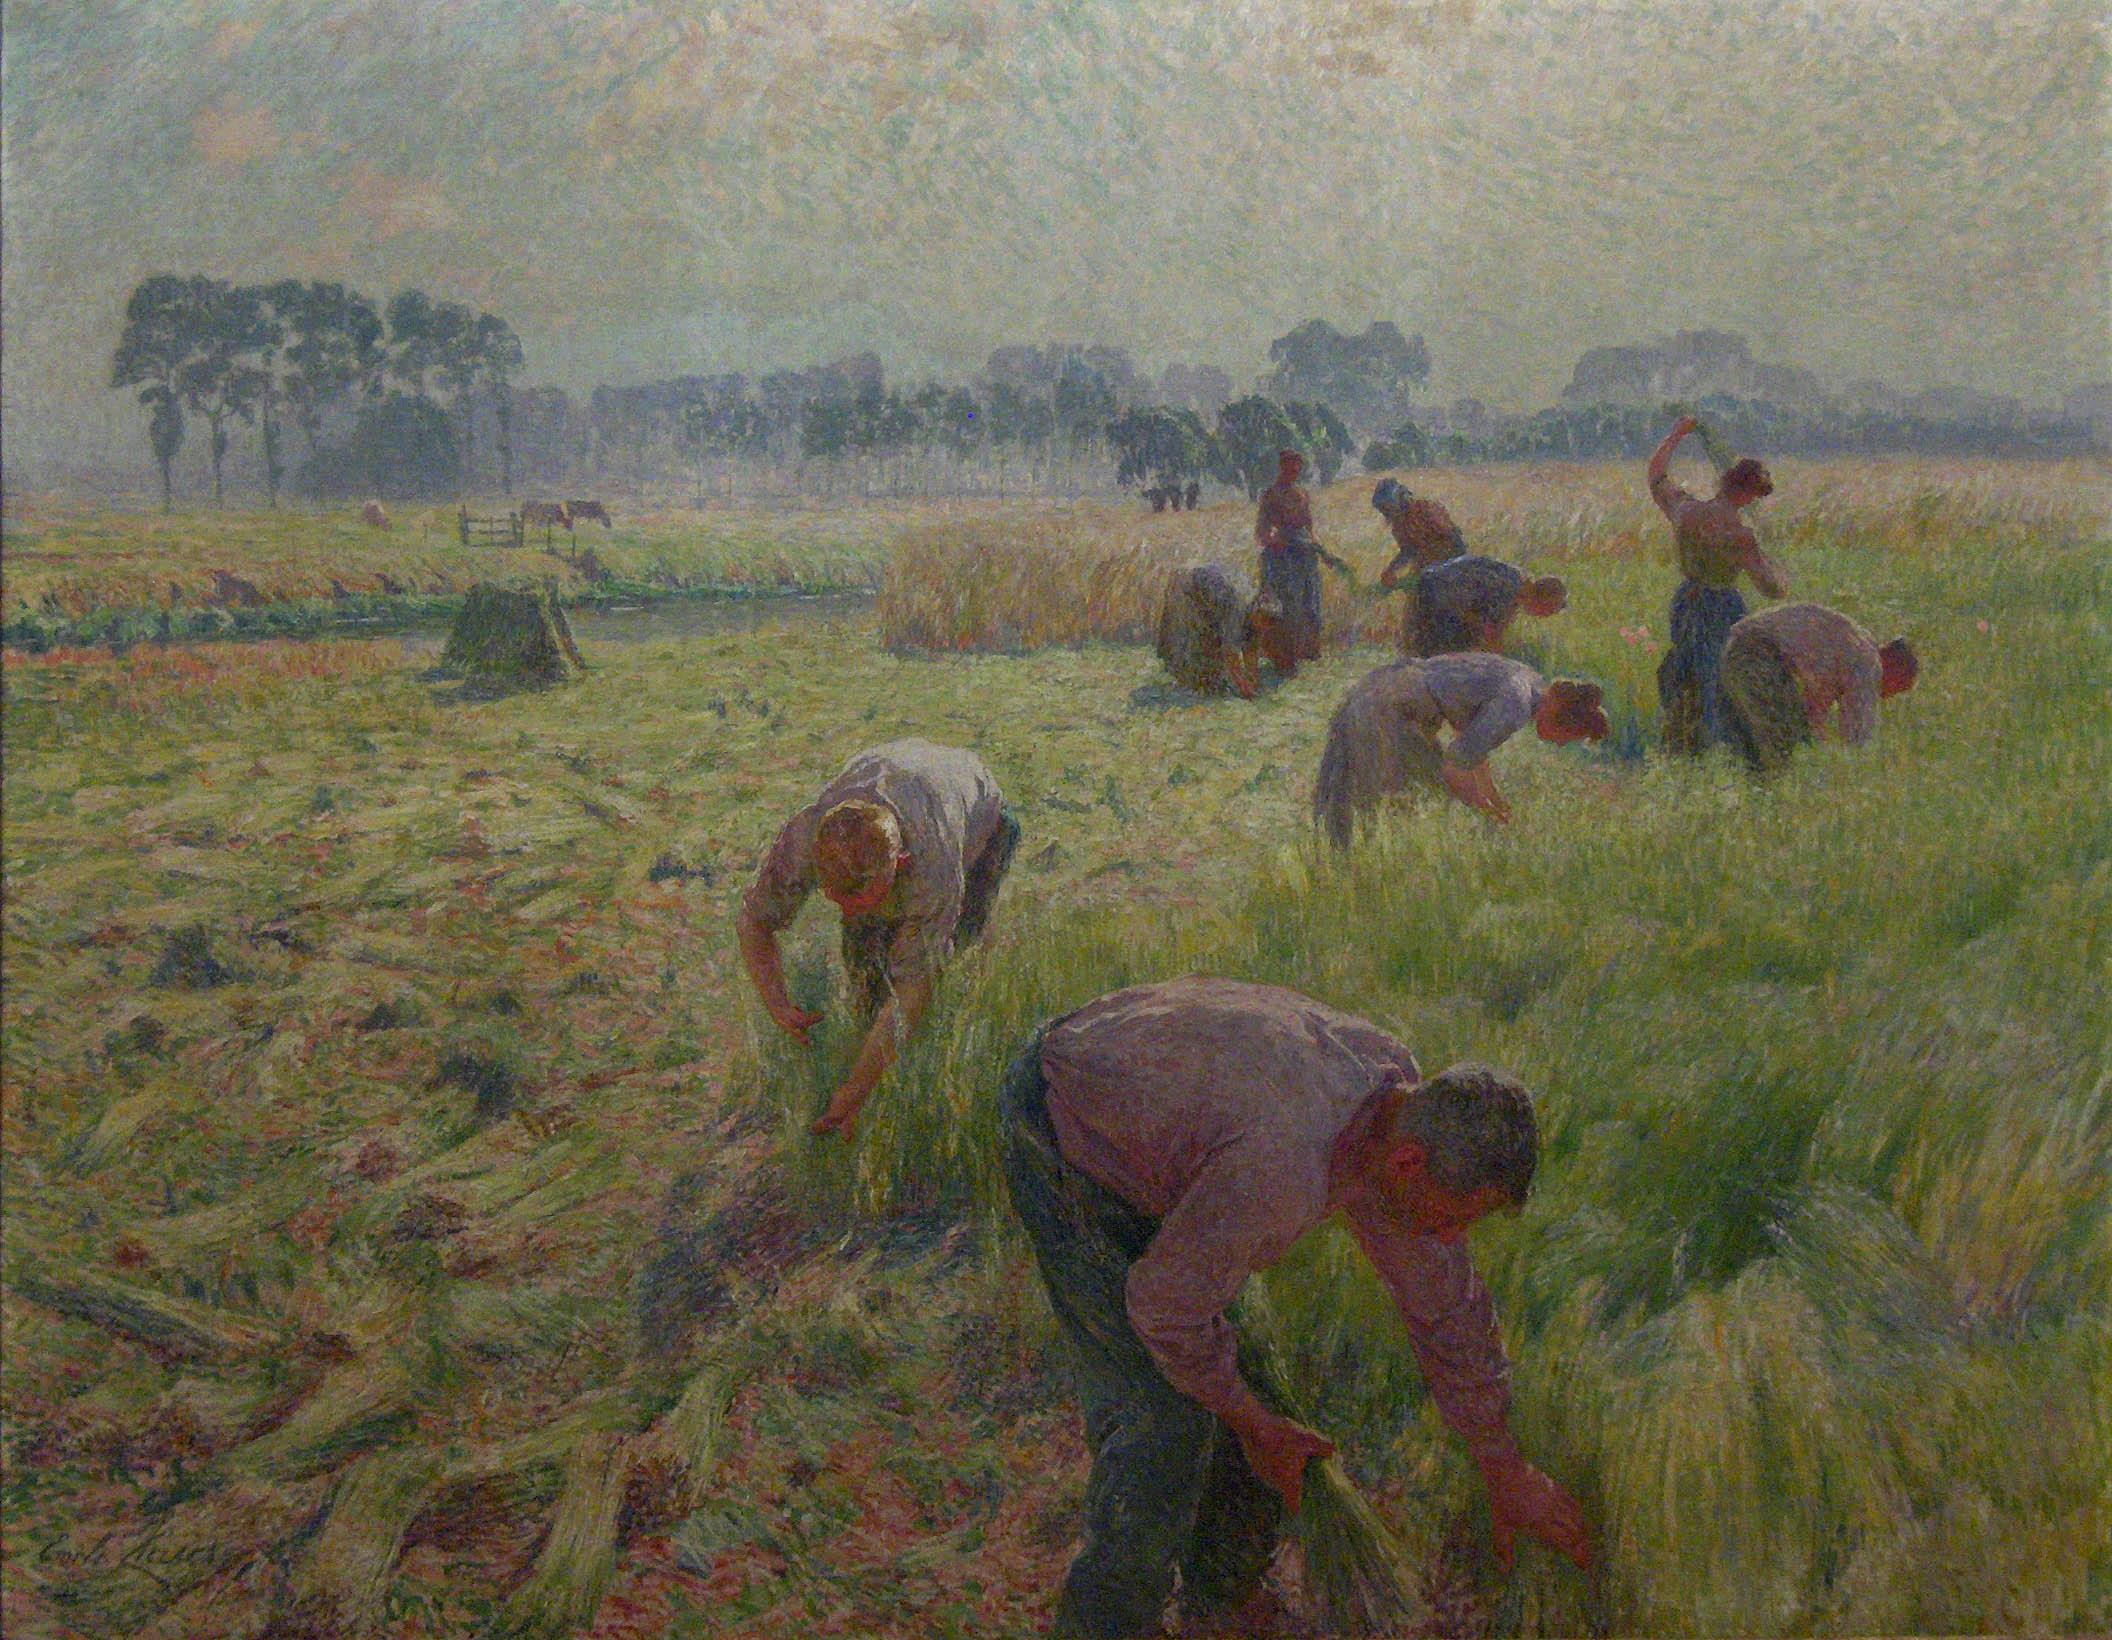 "evlasoogst1904""laxharvesting""paintingbymilelaus,oyaluseumsofinertsofelgium,russels,elgium"